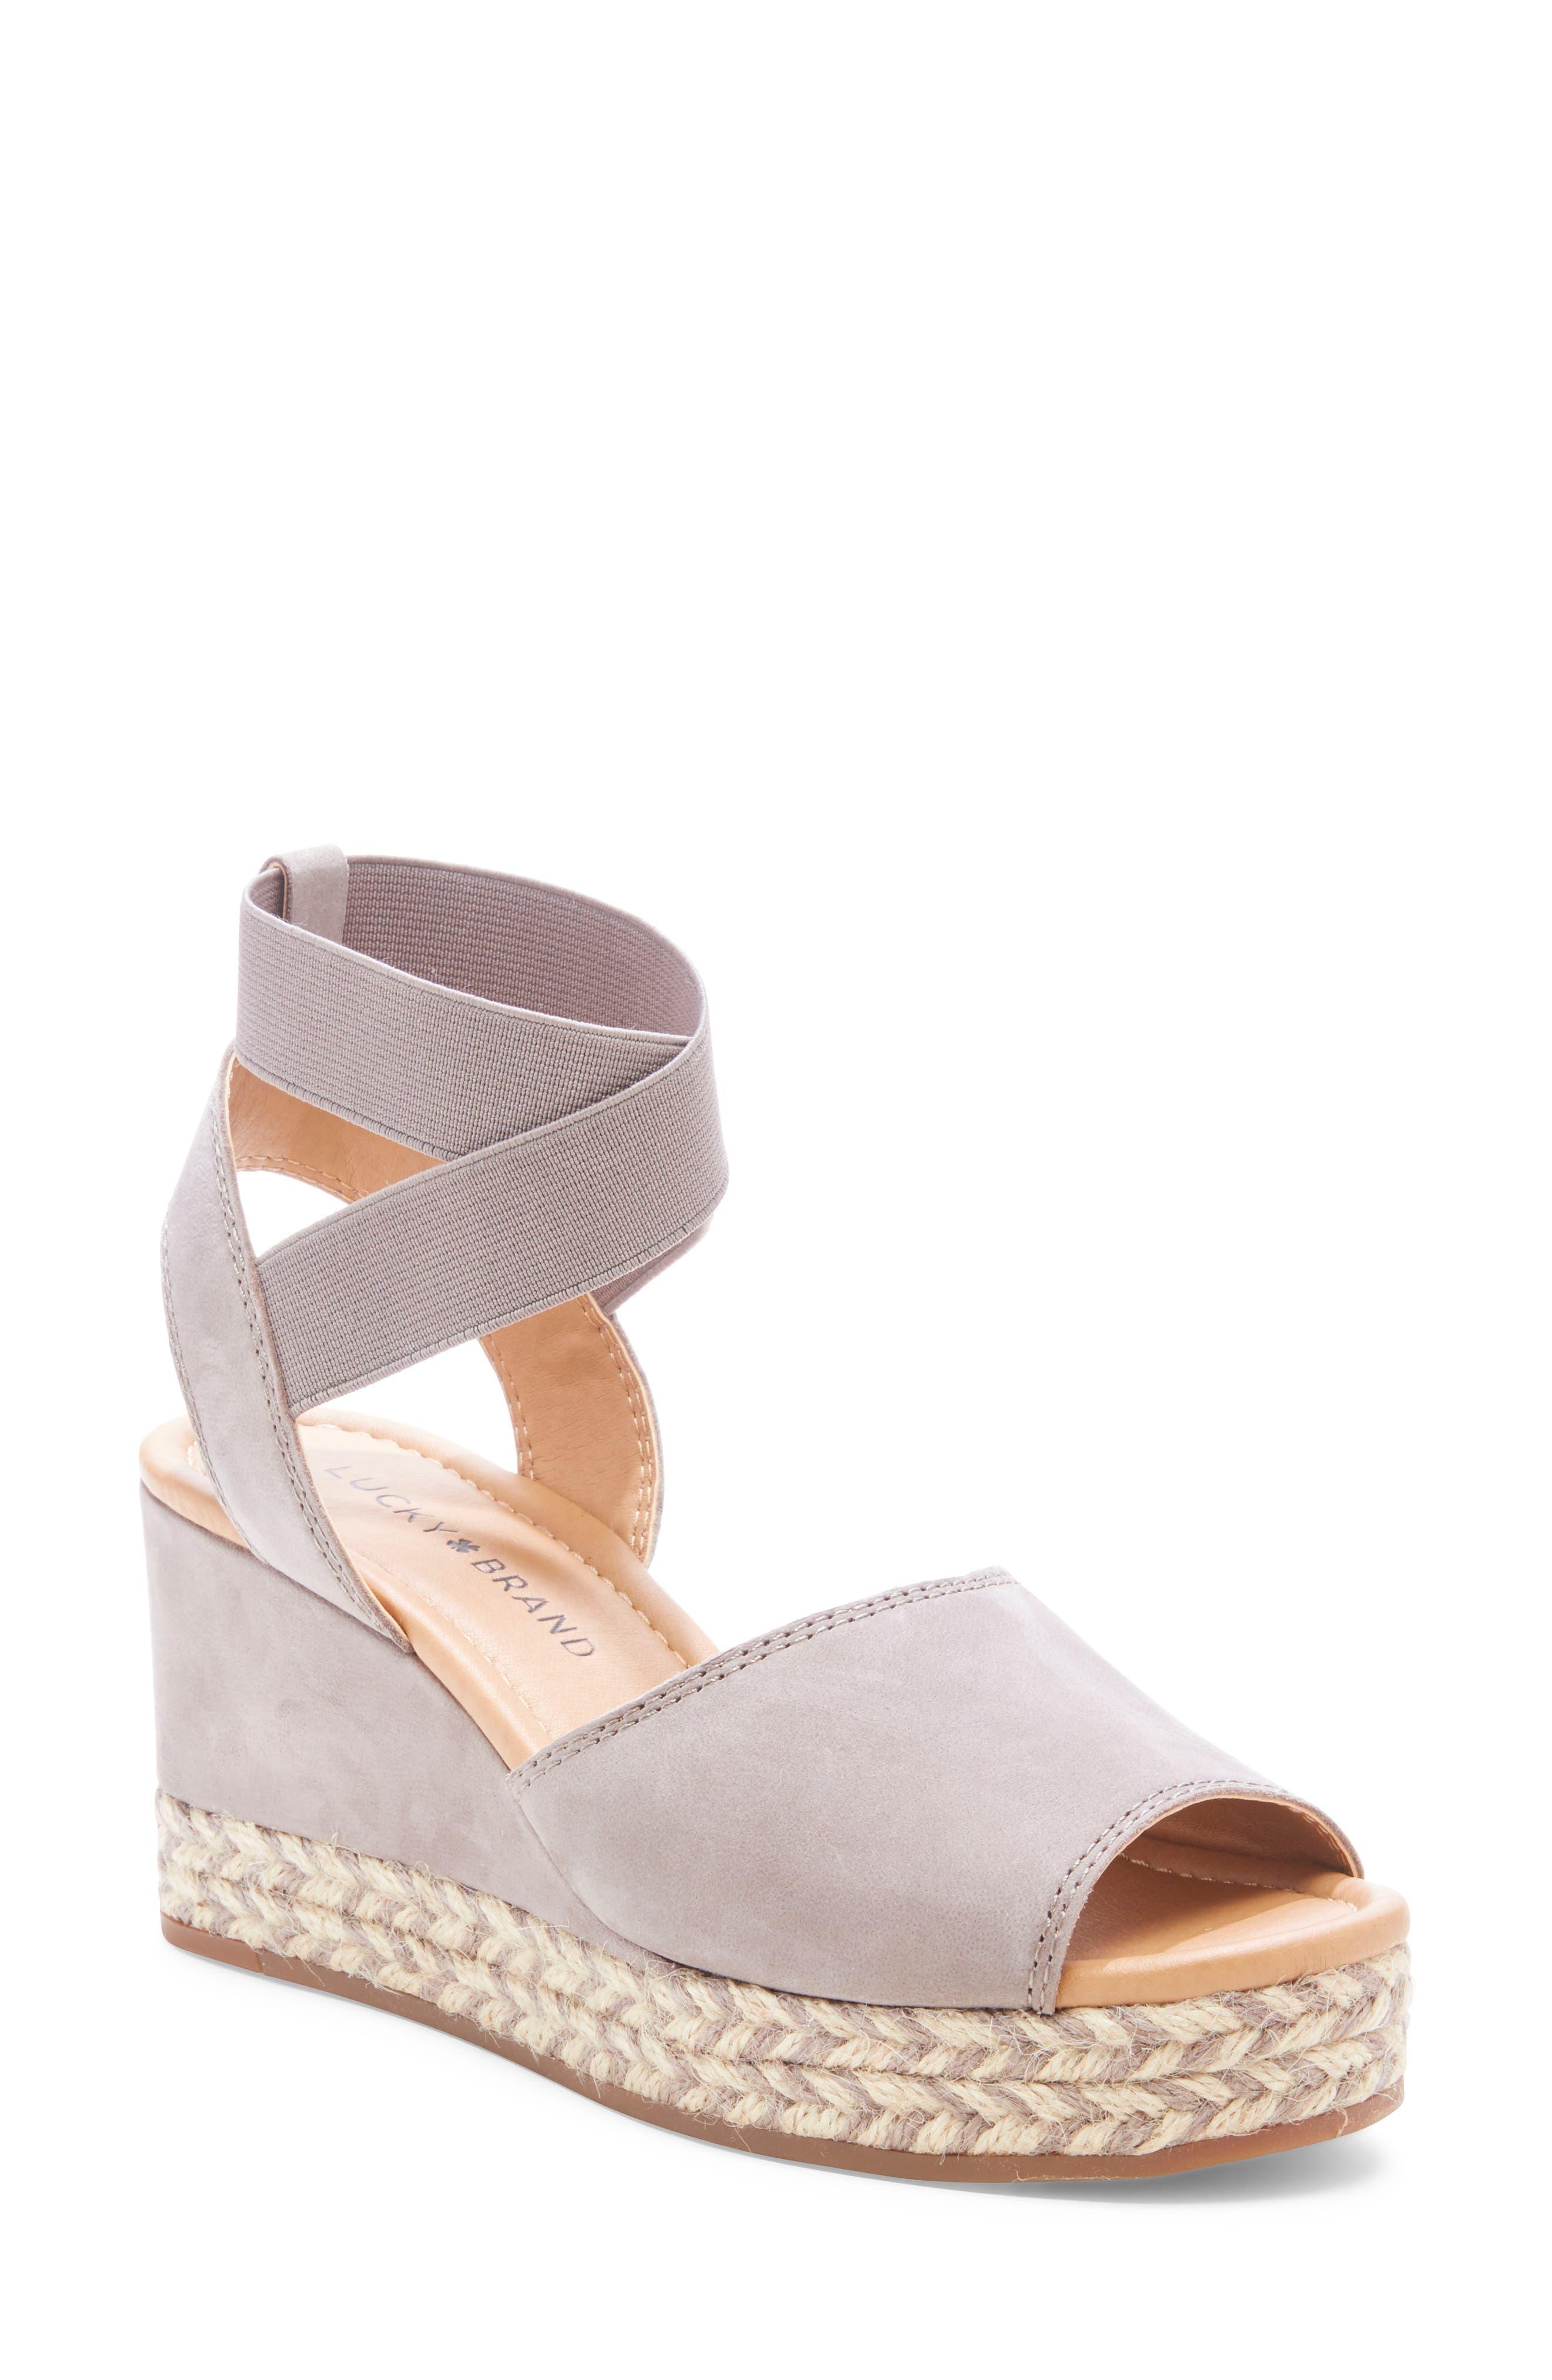 Lucky Brand Bettanie Espadrille Wedge Sandal- Grey